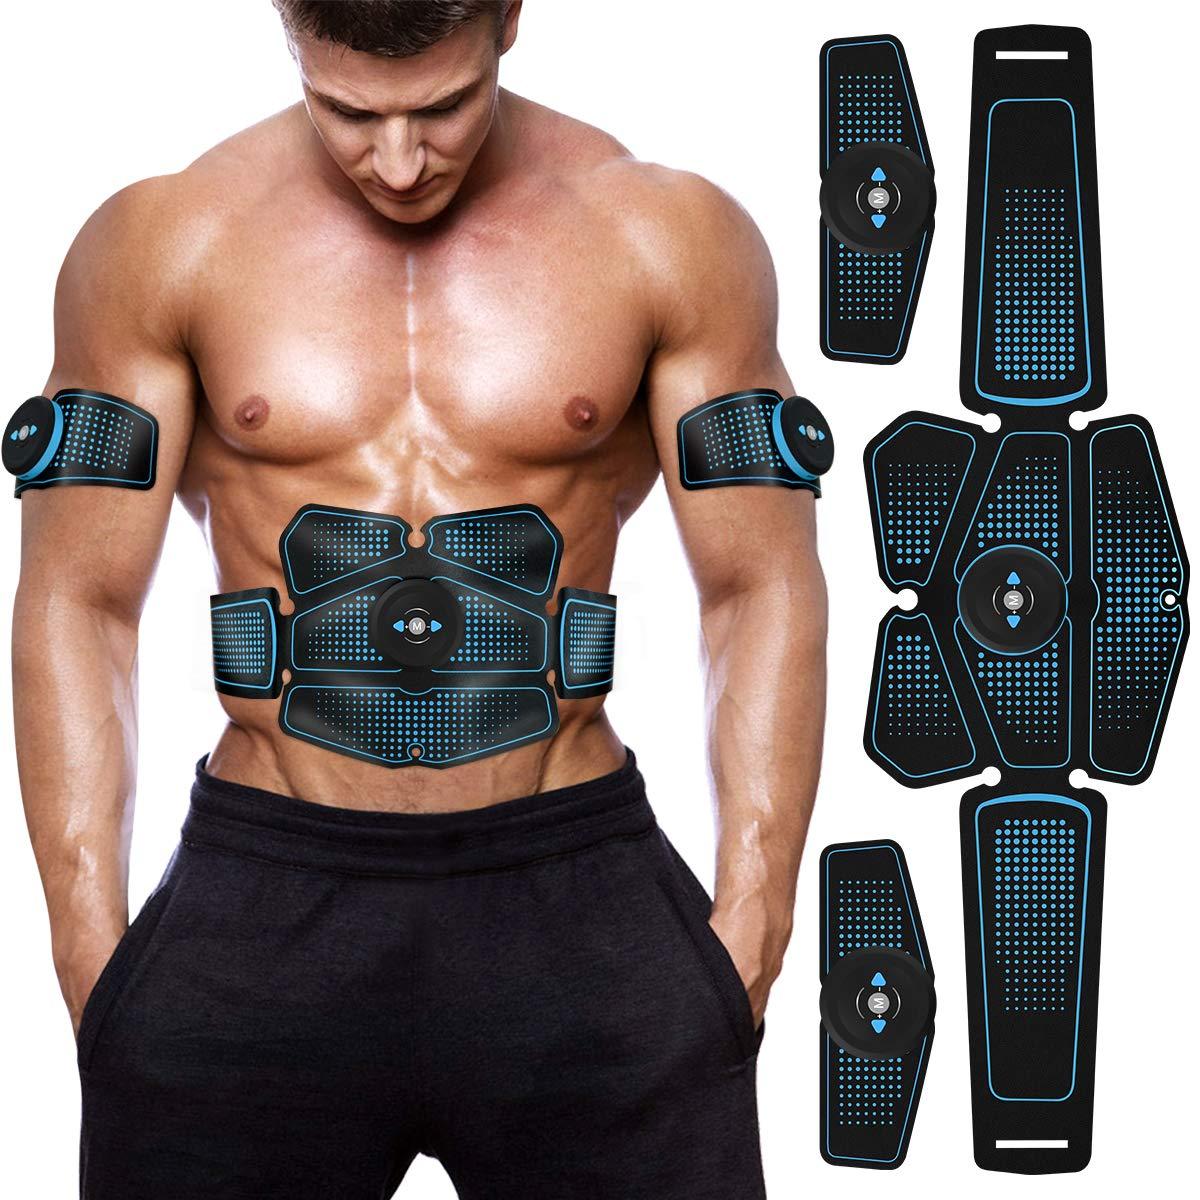 Máquina Eléctrica de Tóner para musculación de equipos de Fitness, cinta tonificadora inalámbrica, 6 quemadores de grasa en paquete, máquina EMS